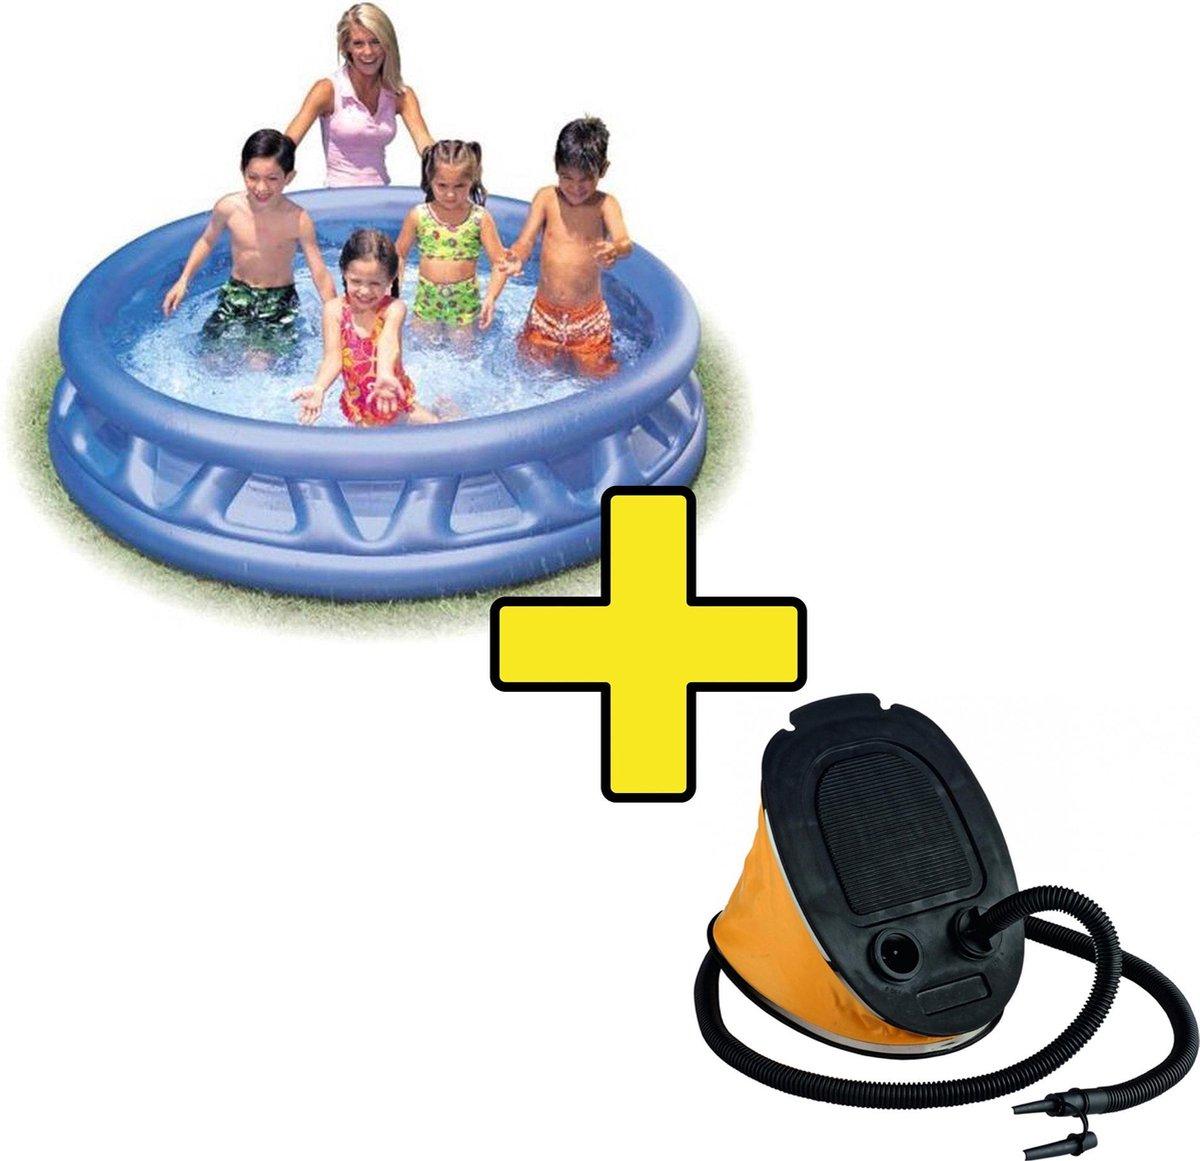 Intex Soft Pool Zwembad inclusief 5 liter Pomp - Voetpomp - Opblaaszwembad - 188 x 46 cm